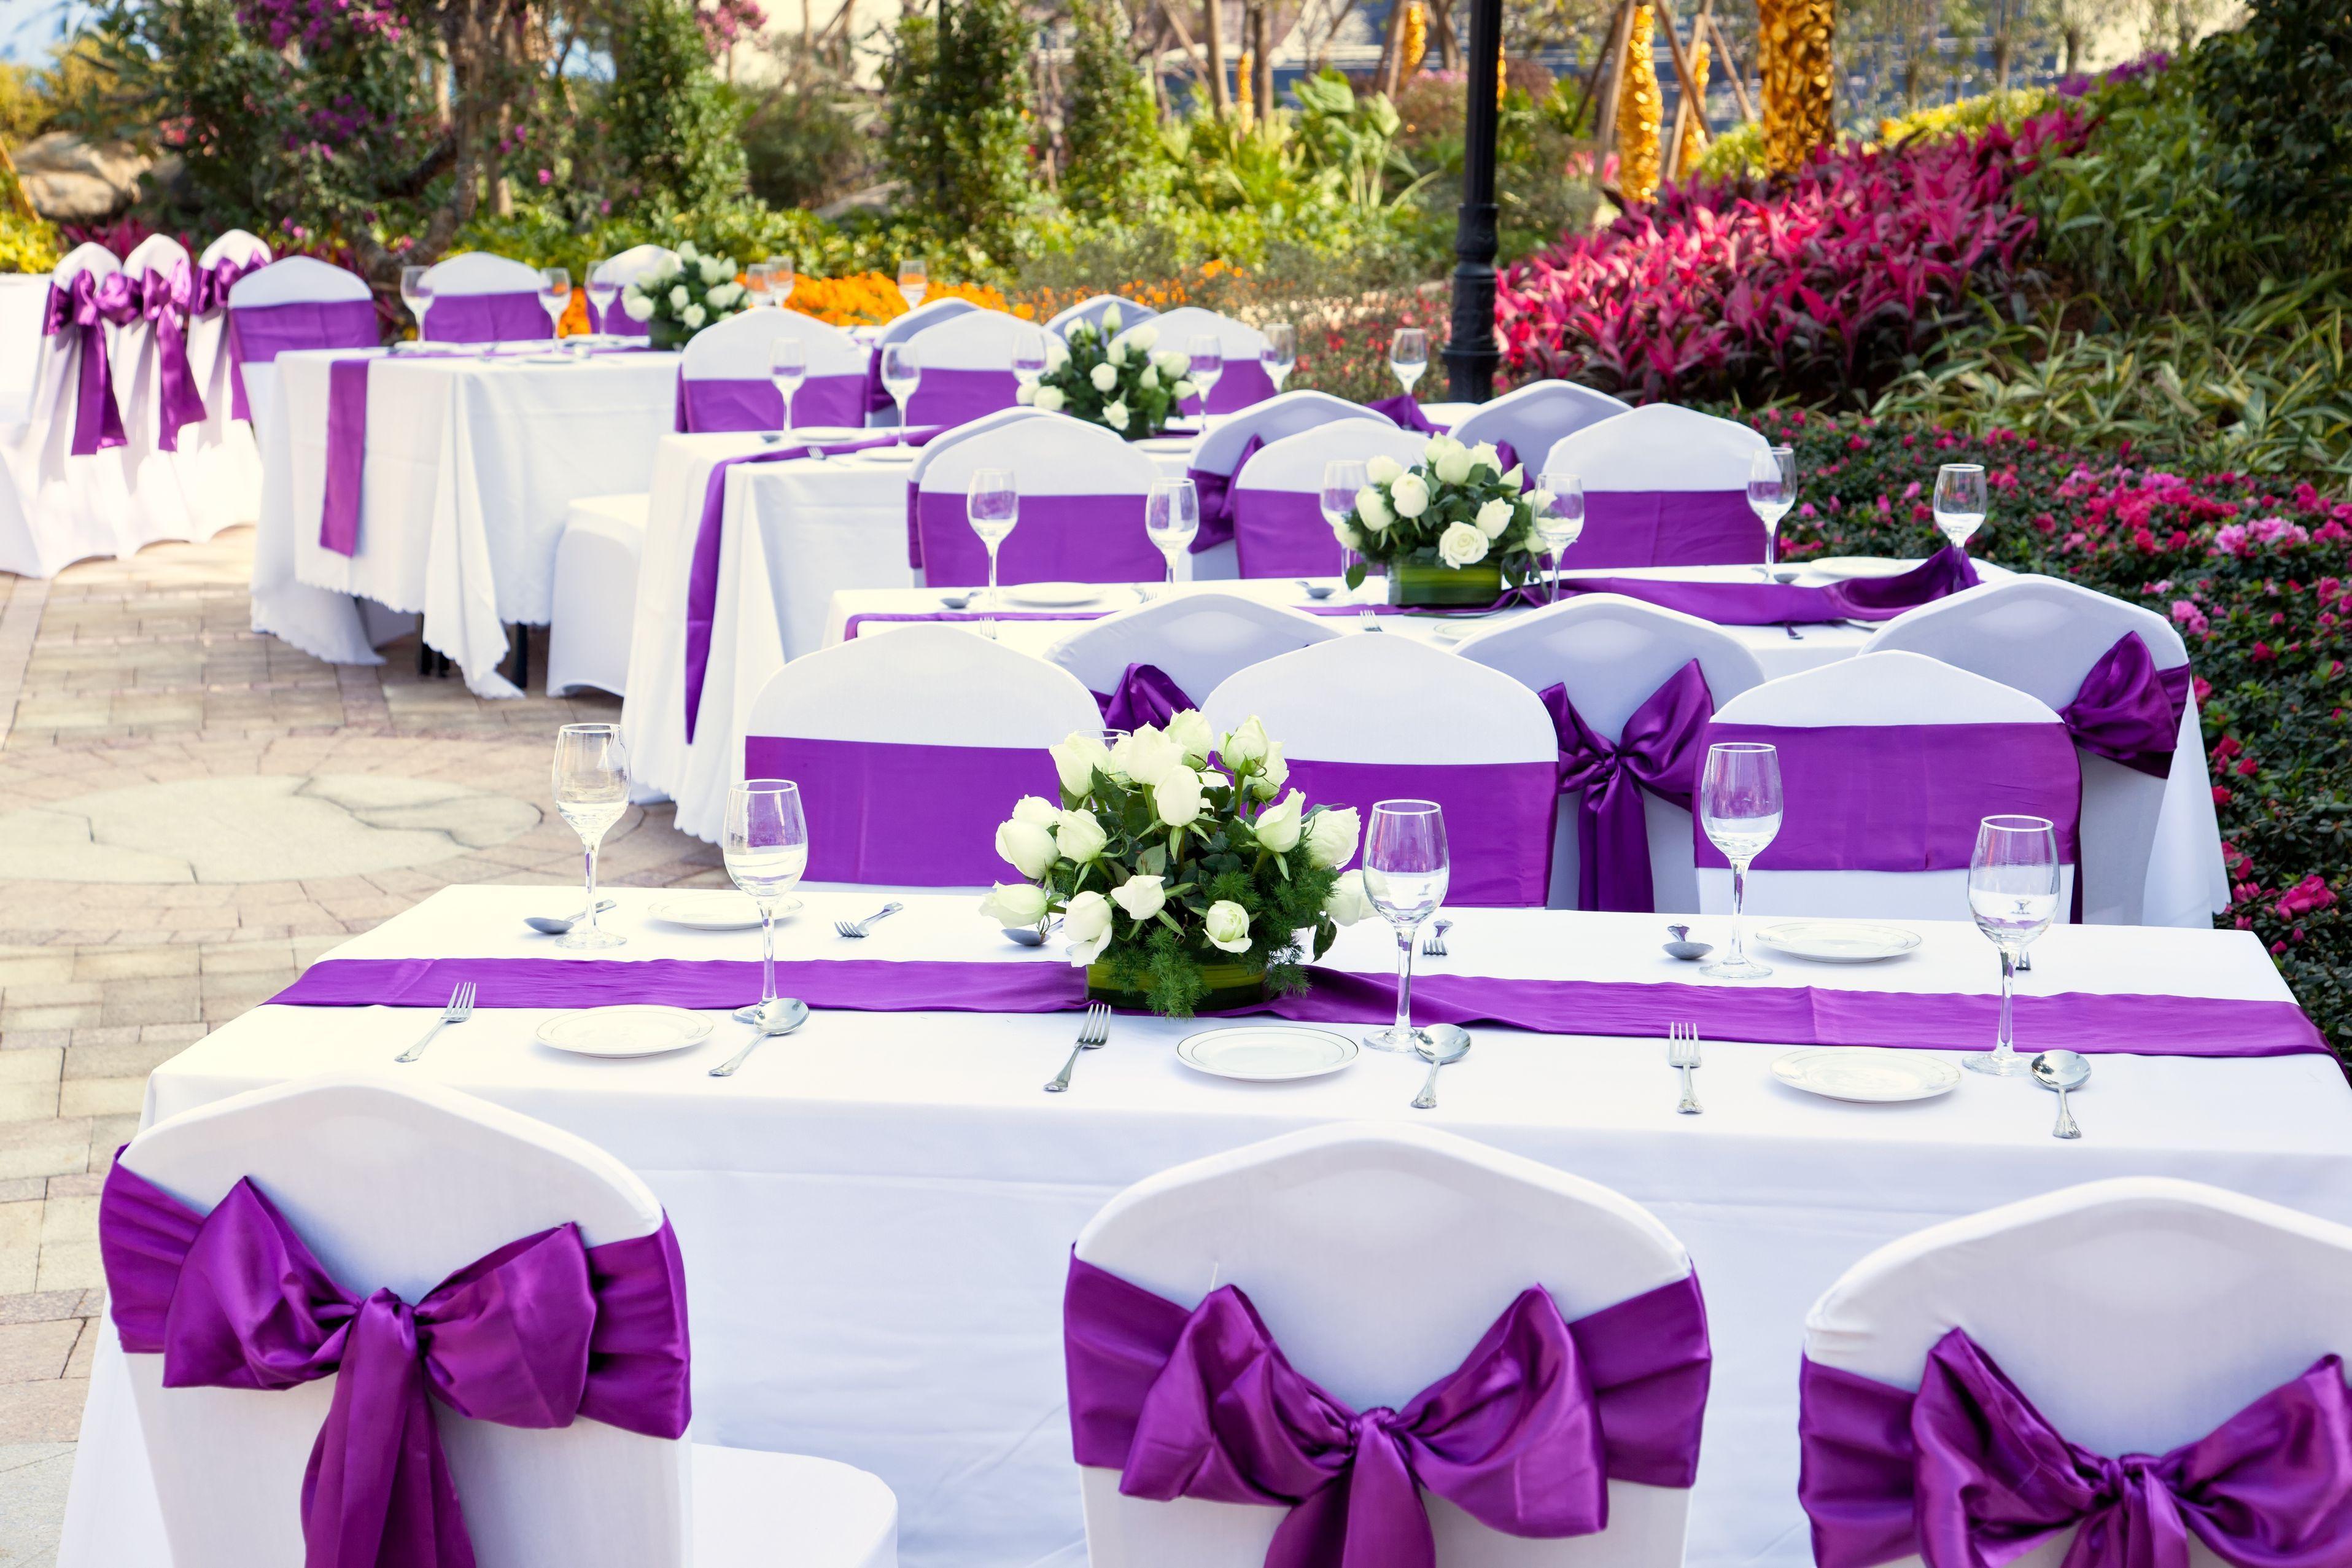 Wedding Decorations Wholesale Uk Garden Wedding Decorations And